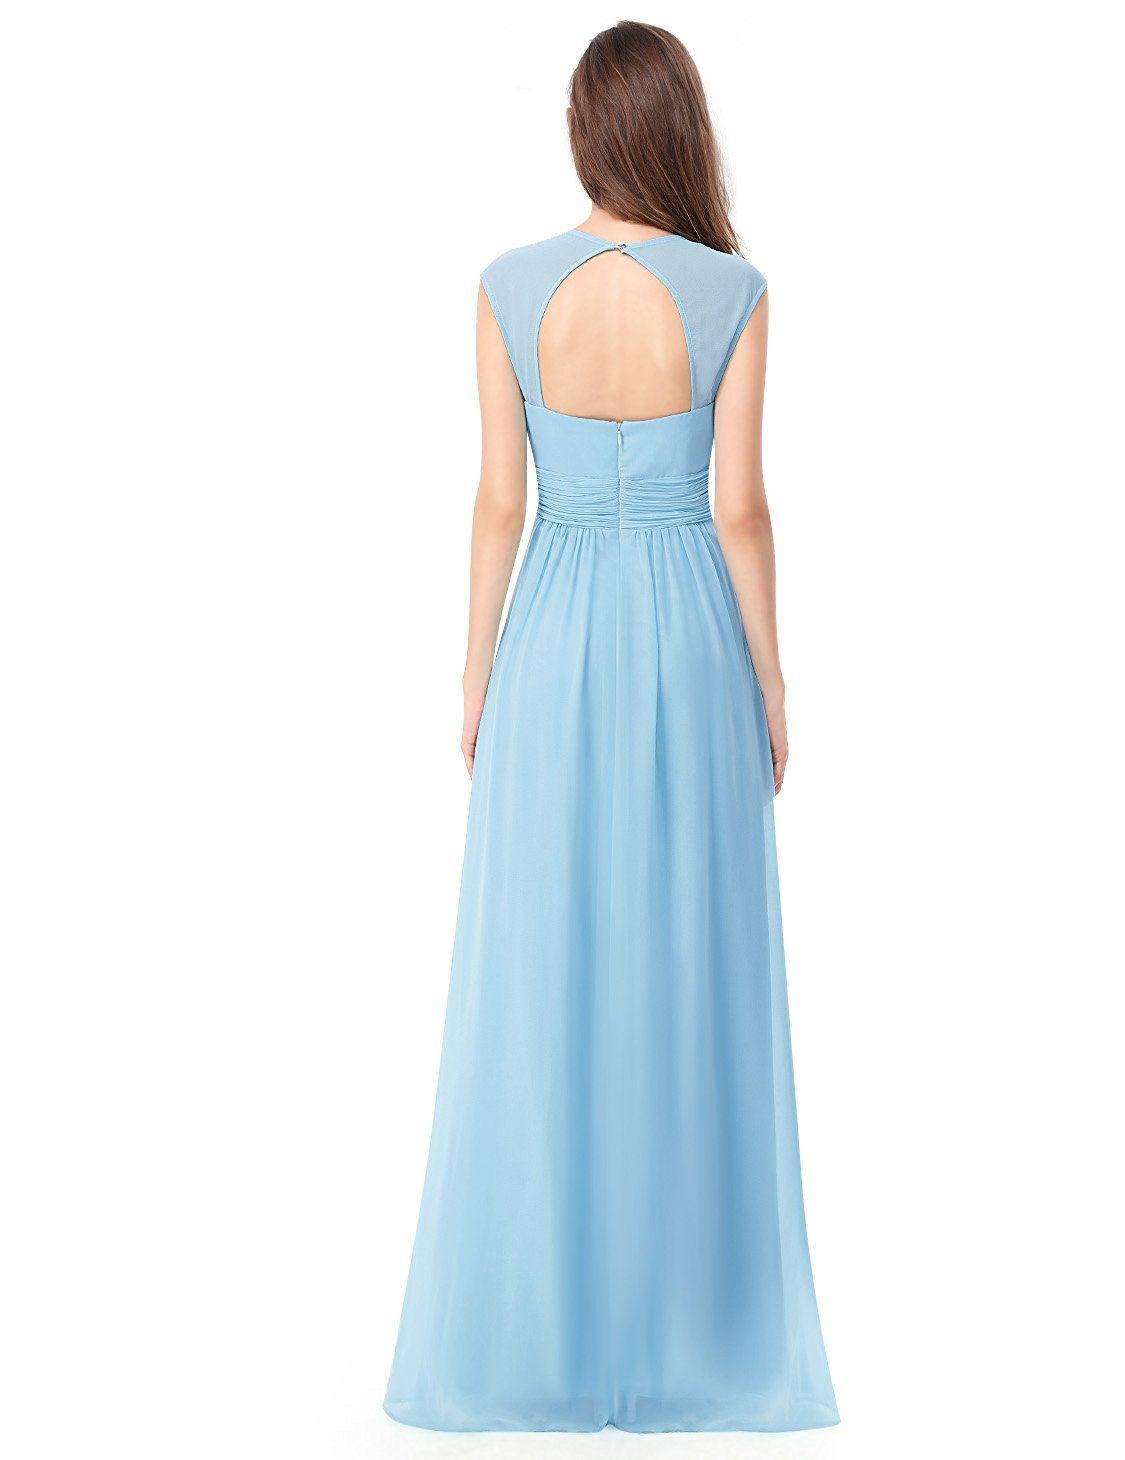 1e993ff2bb3 Ever-Pretty Womens Floor Lenth Short Sleeve Graduation Dress 08697 ...